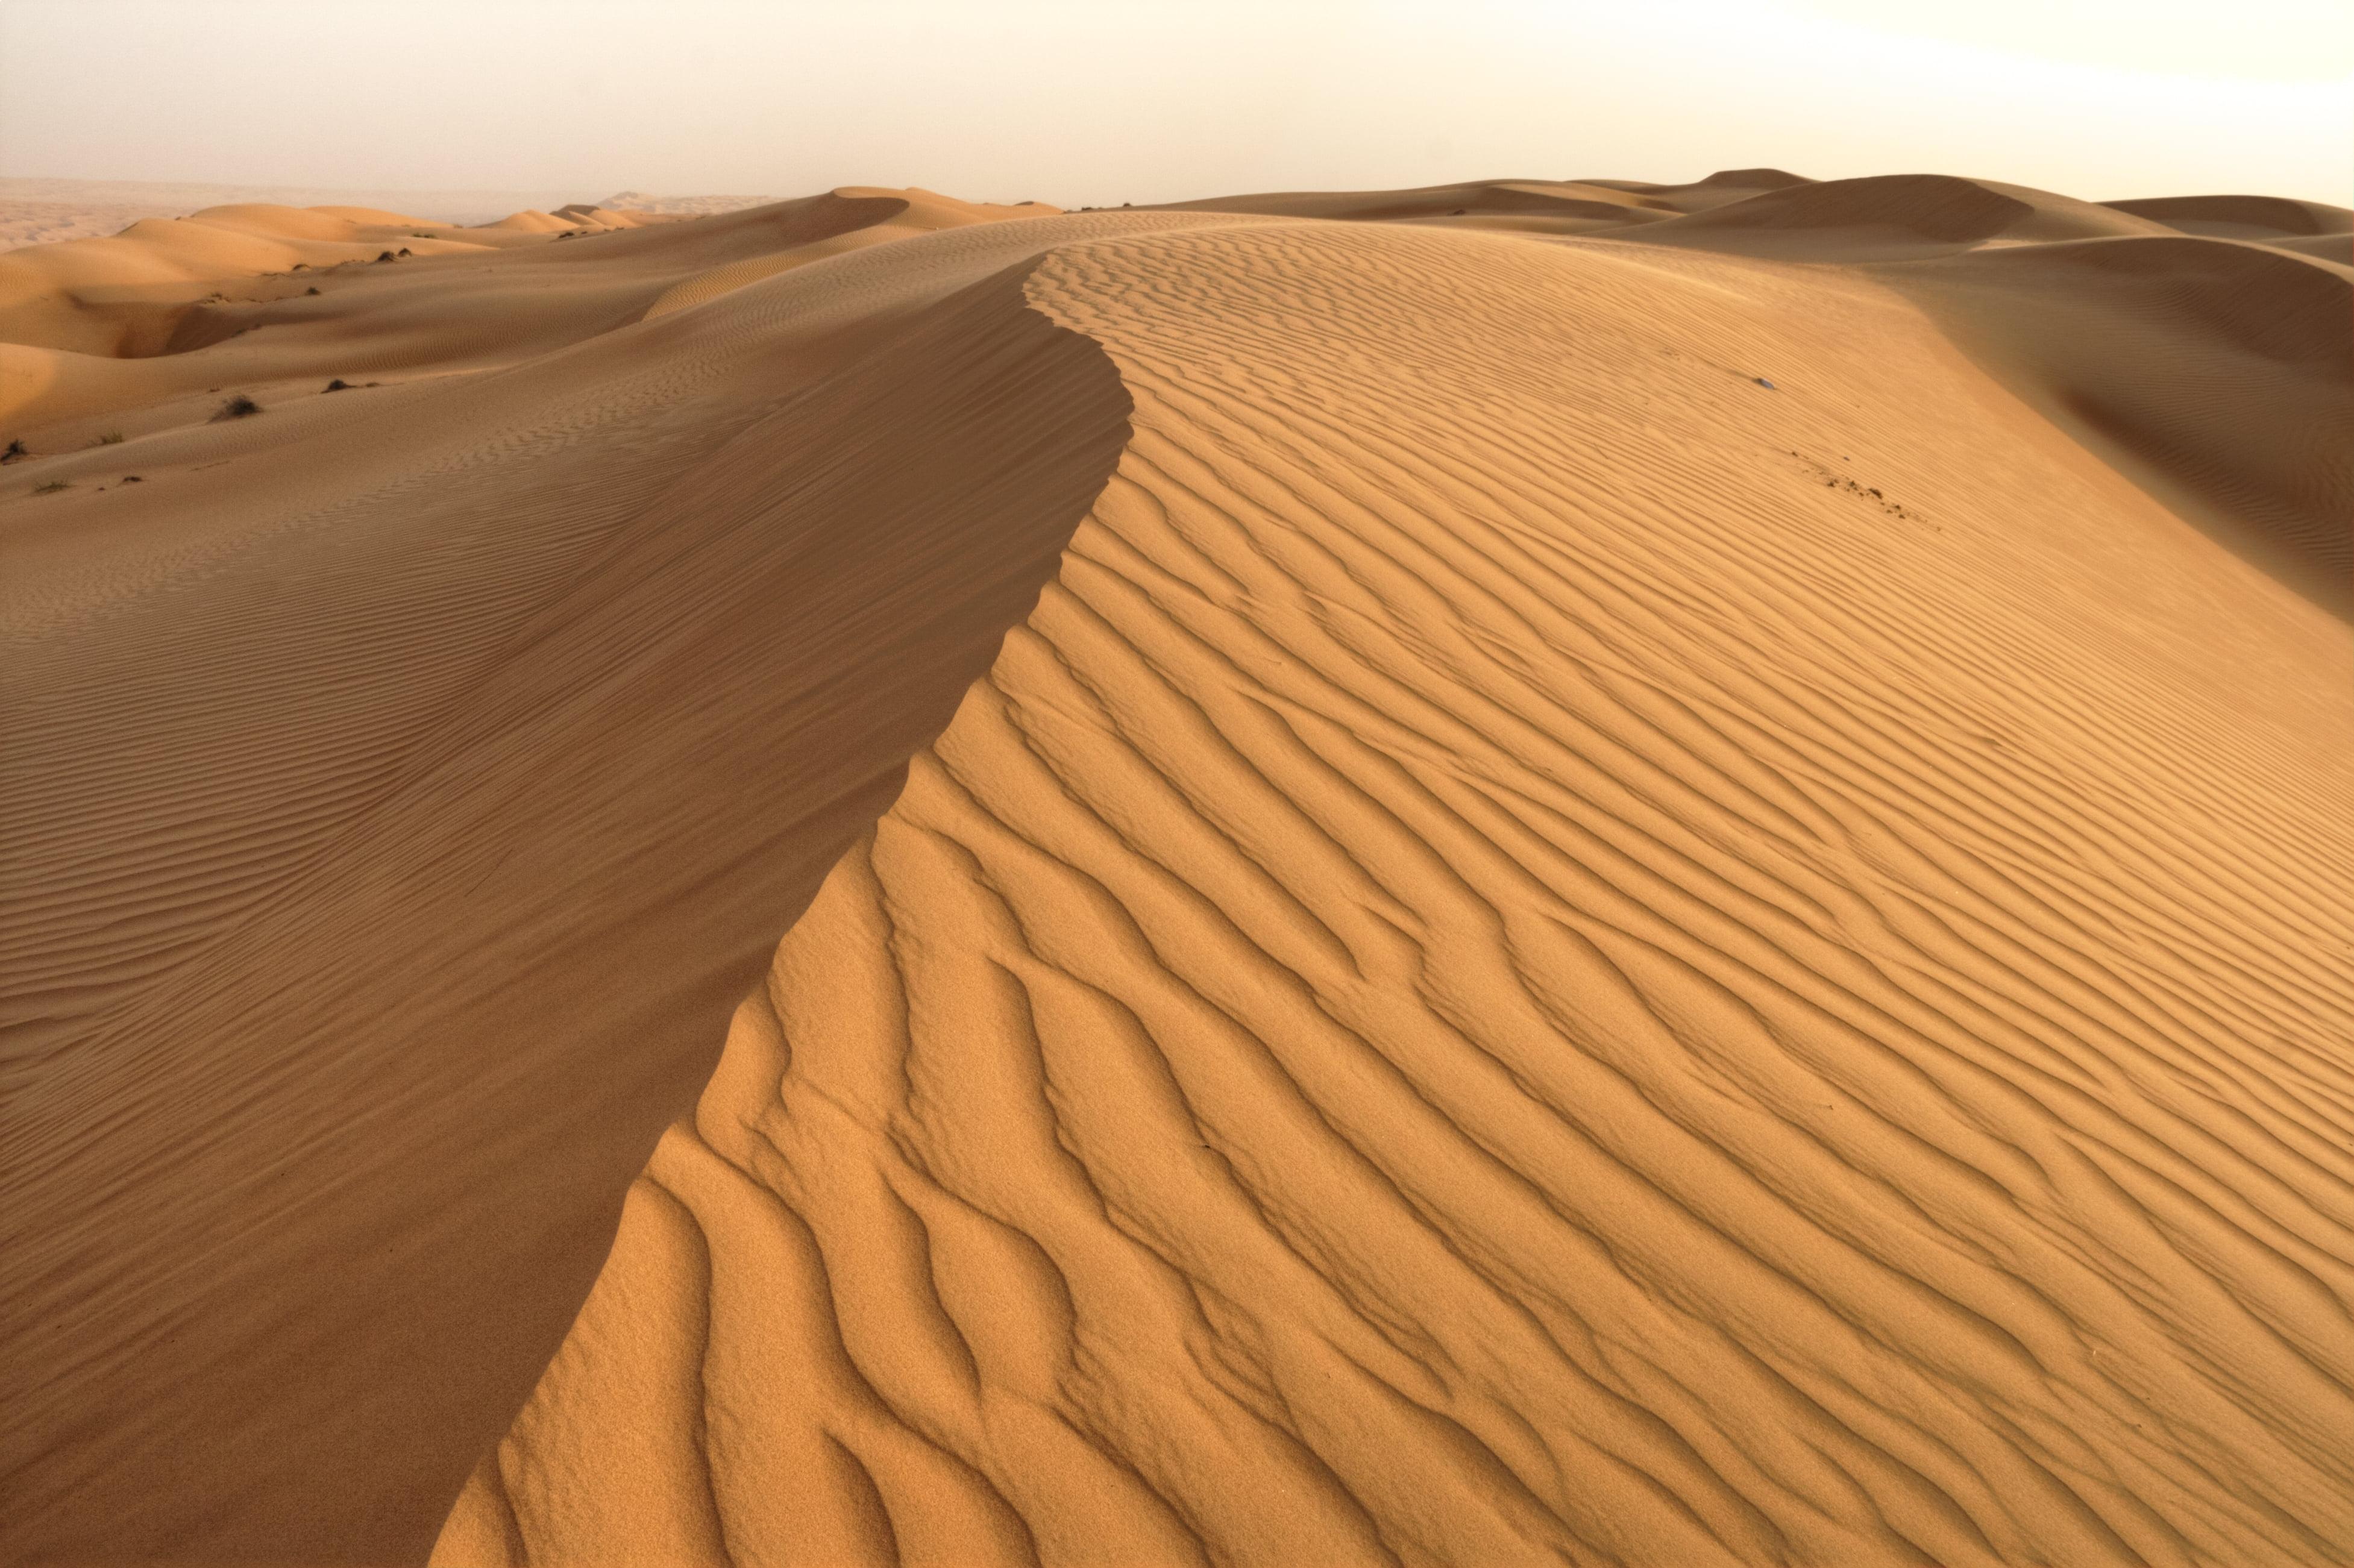 Landscape Photography Of Desert, Oman Hd Wallpaper - Natural Landscape Photography Desert , HD Wallpaper & Backgrounds